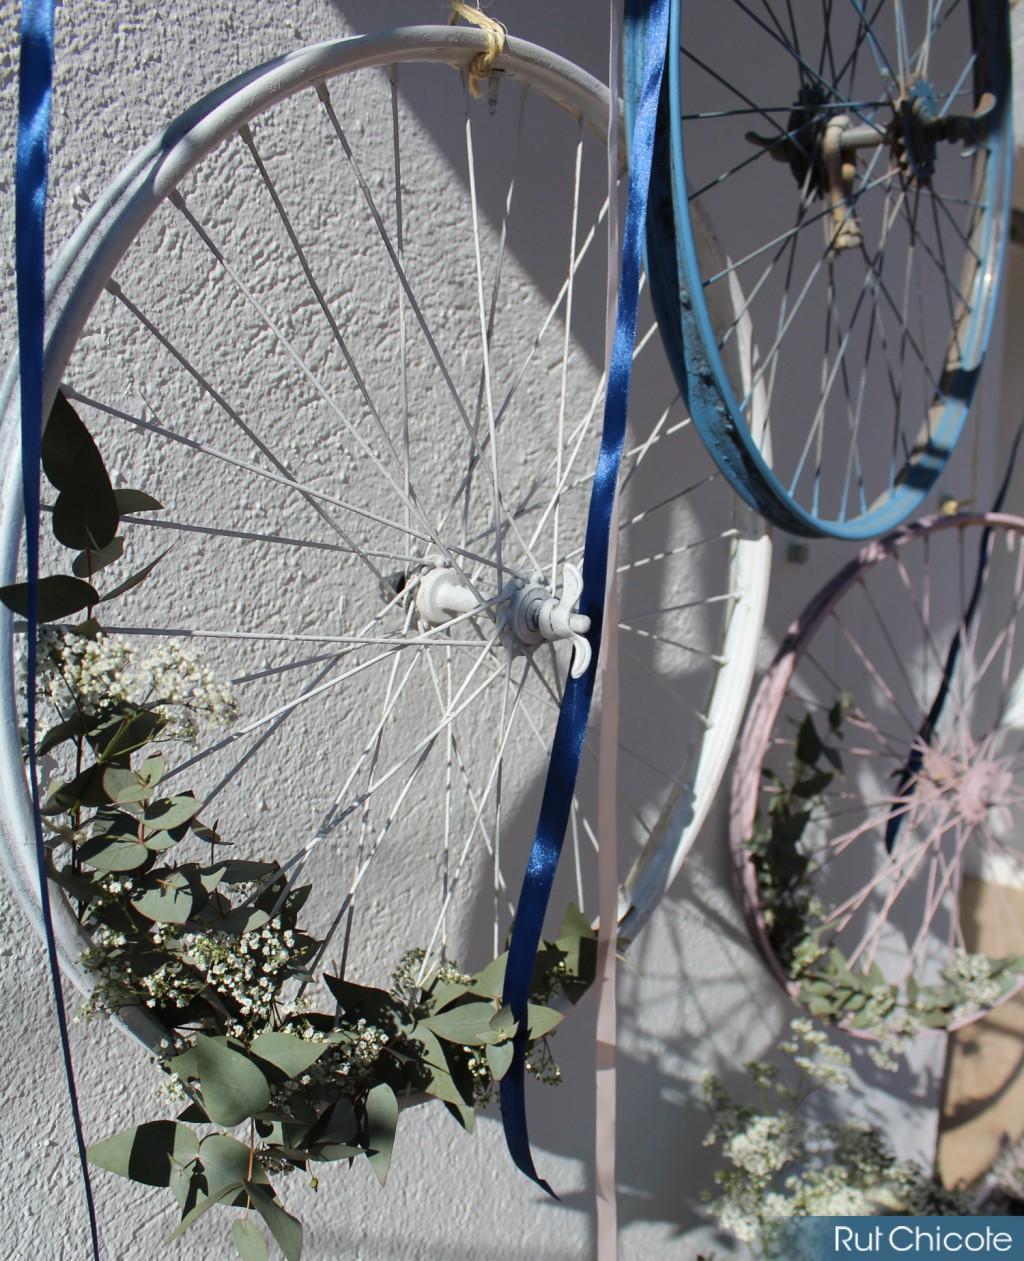 Llantas-decoradas-con-flores-para-decoración-de-mesas